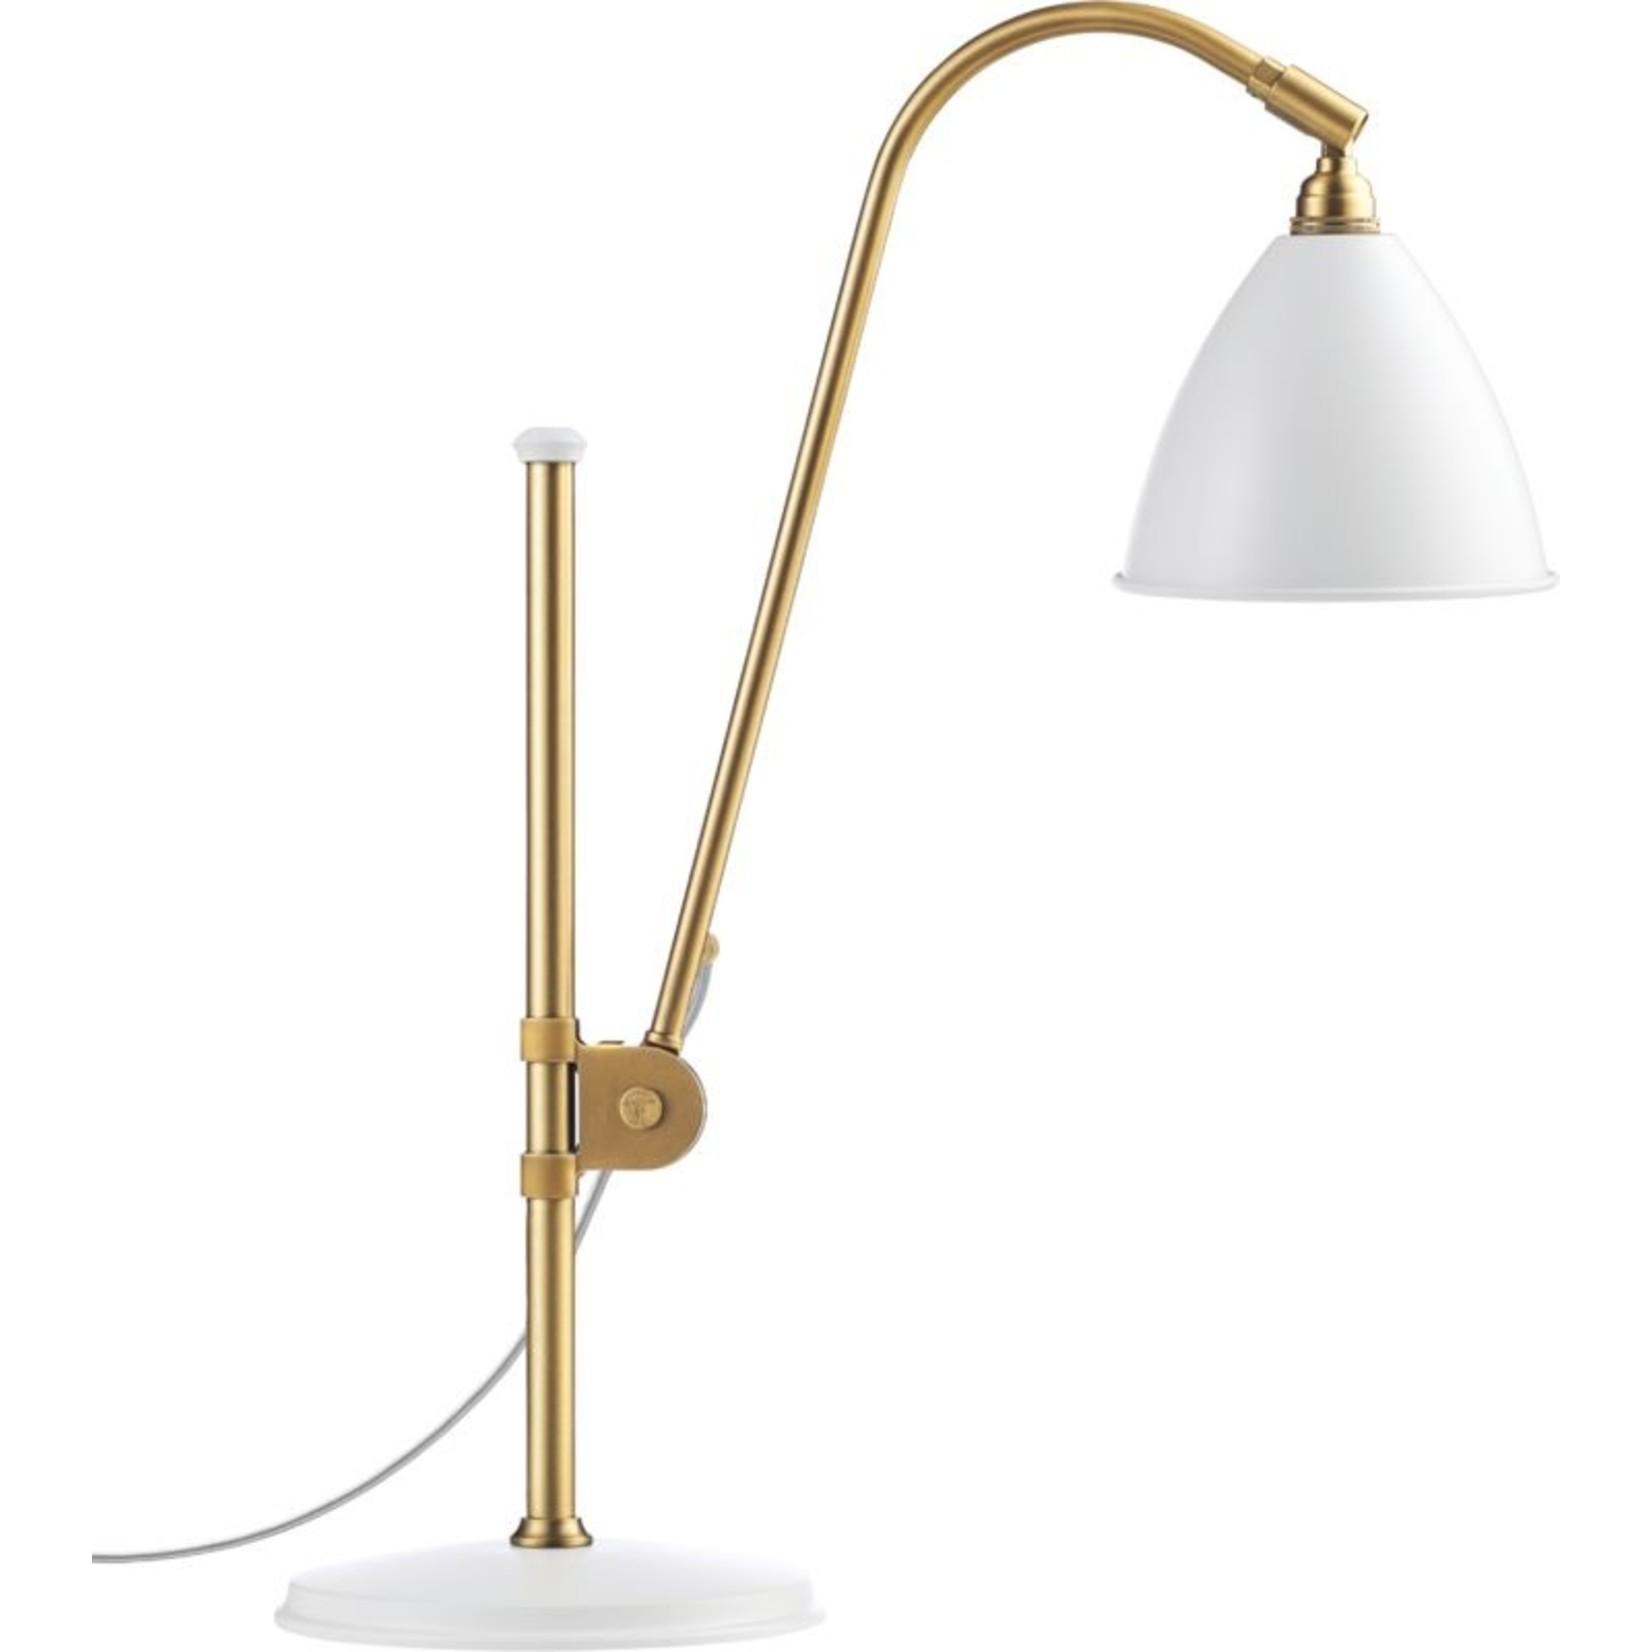 Gubi BL1 Table Lamp - Ø16 | Brass Base & Soft White Semi Matt Shade